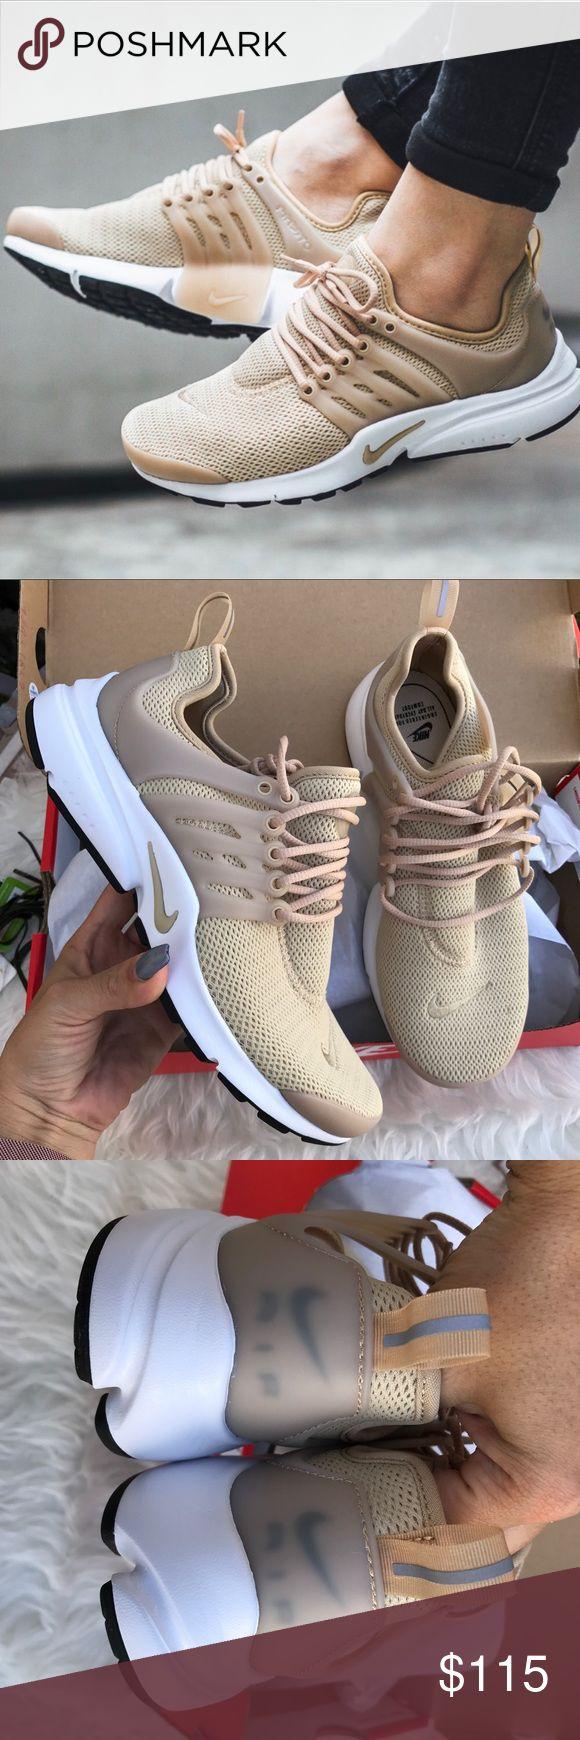 NIKE AIR PRESTO LINEN LIMITED EDITION COLOR Sz 7 NIKE AIR PRESTO LINEN COLOR SOLD OUT Sz 7 new 100% authentic! Itemcloset#seize Nike Shoes